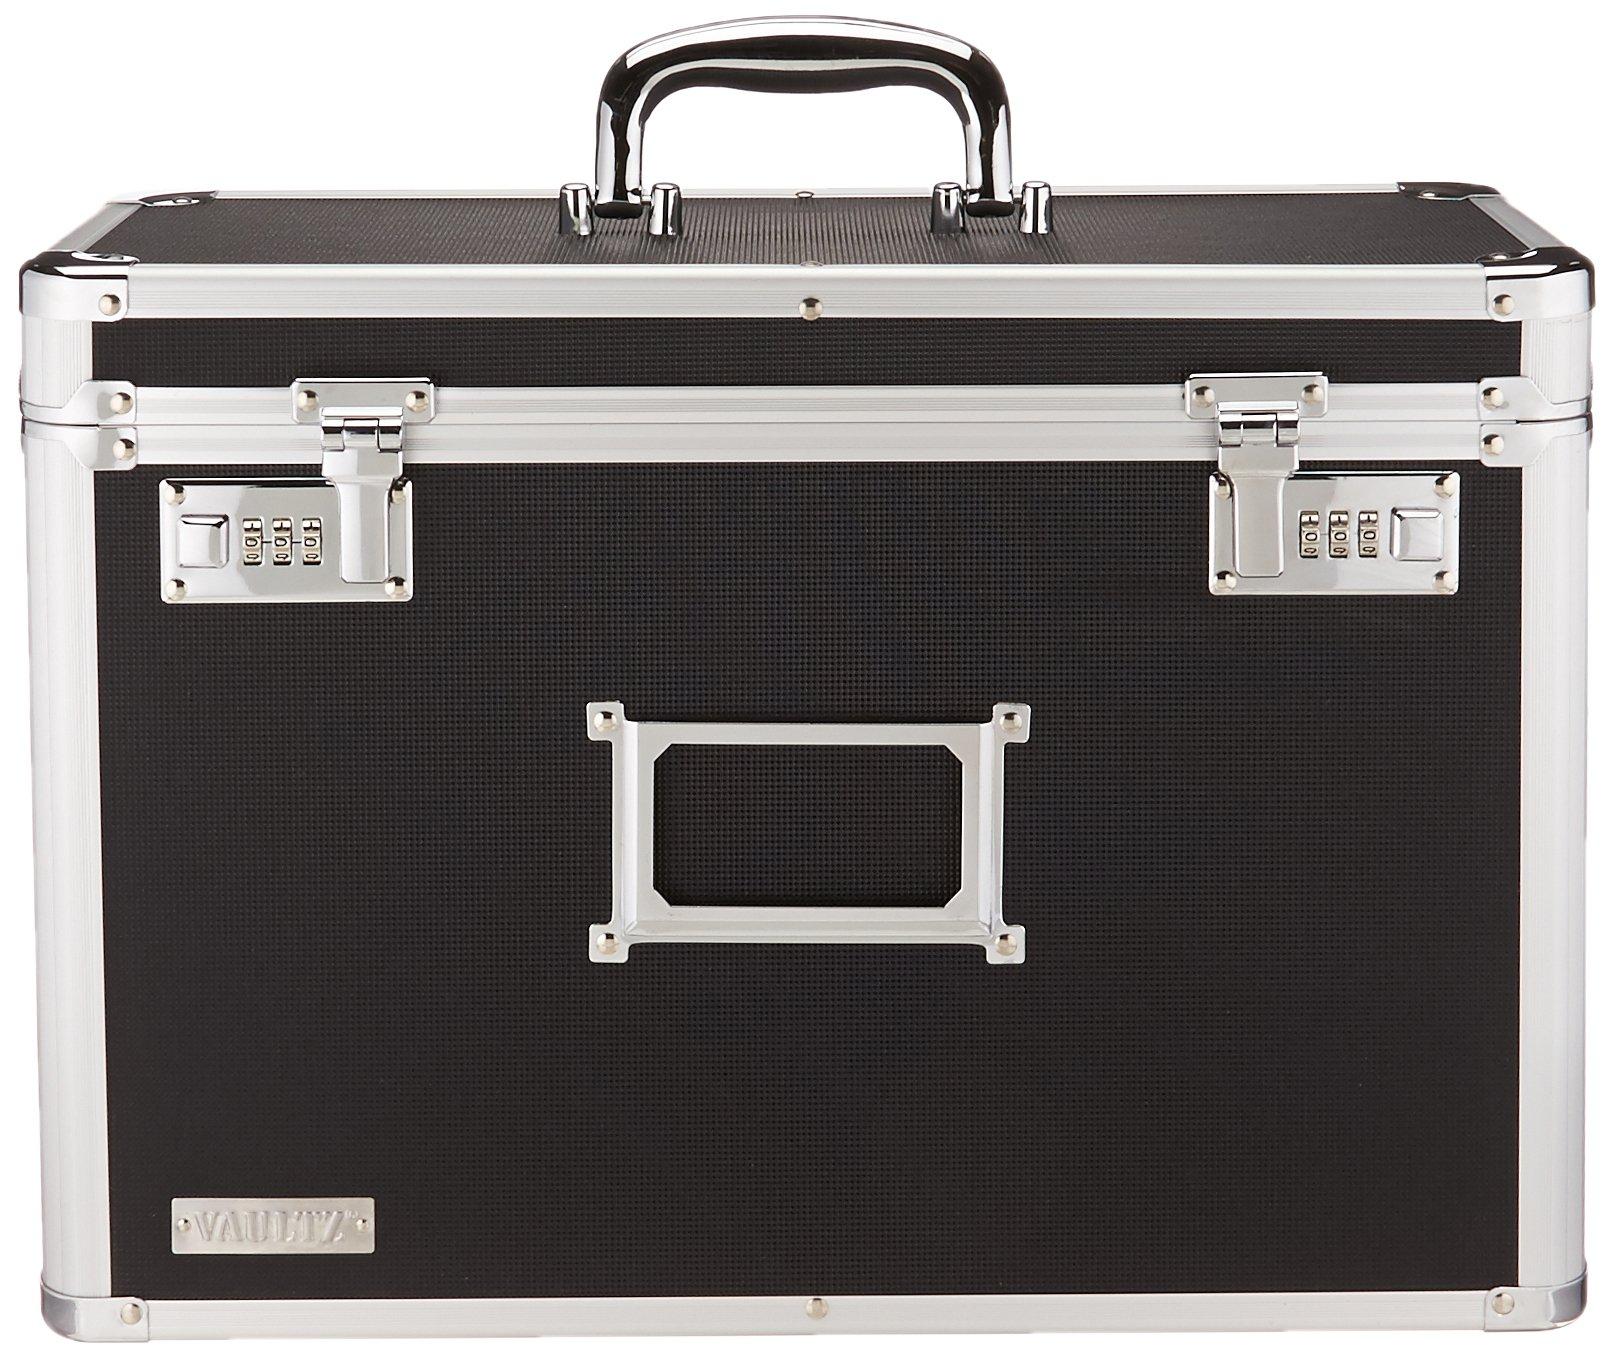 Vaultz Locking Personal File Organizer Tote Box, Legal Size, Black (VZ01189) by Vaultz